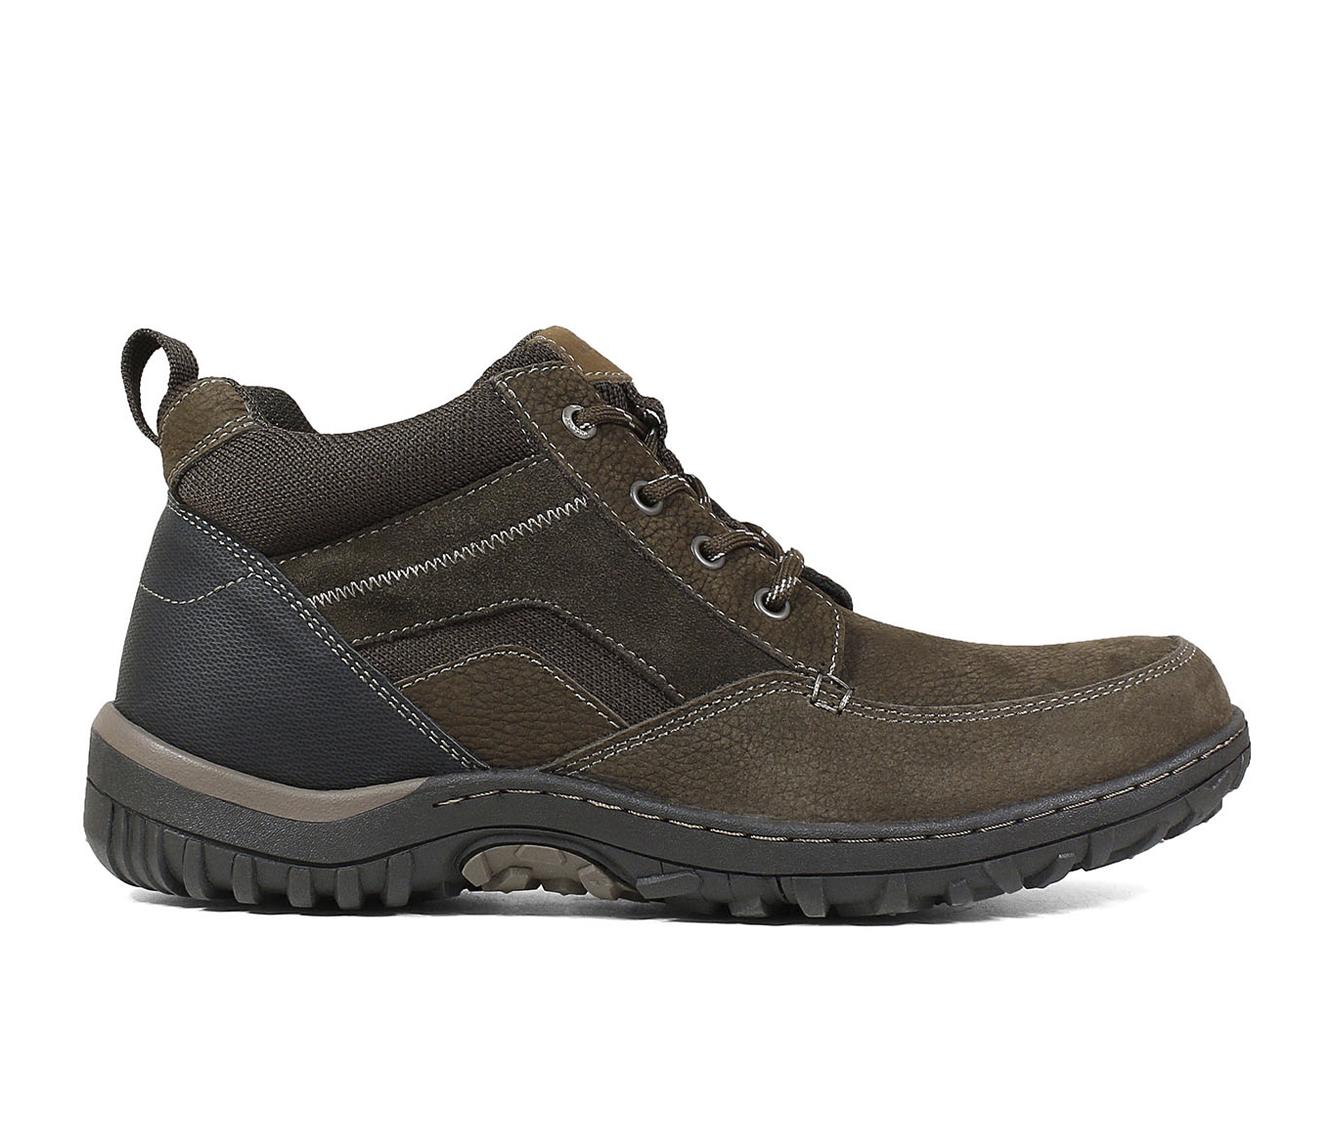 Nunn Bush Quest Moc Toe Chukka Men's Boots (Brown Faux Leather)